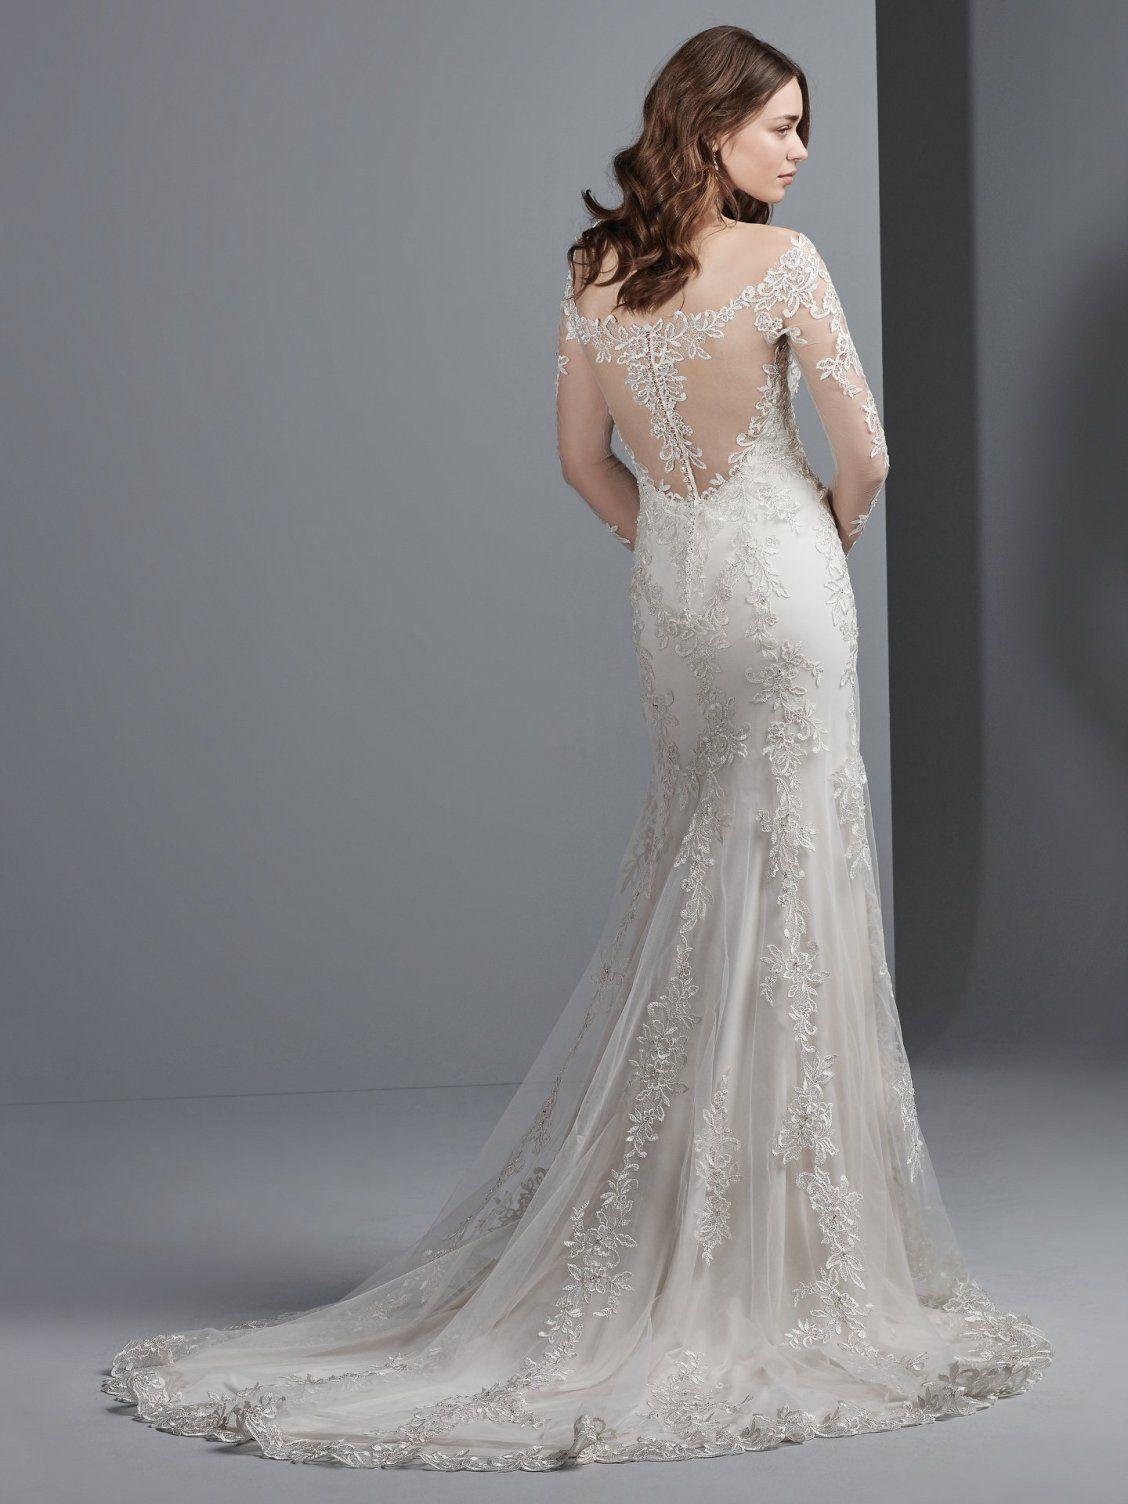 Jillianna By Sottero And Midgley Wedding Dresses Sleeved Wedding